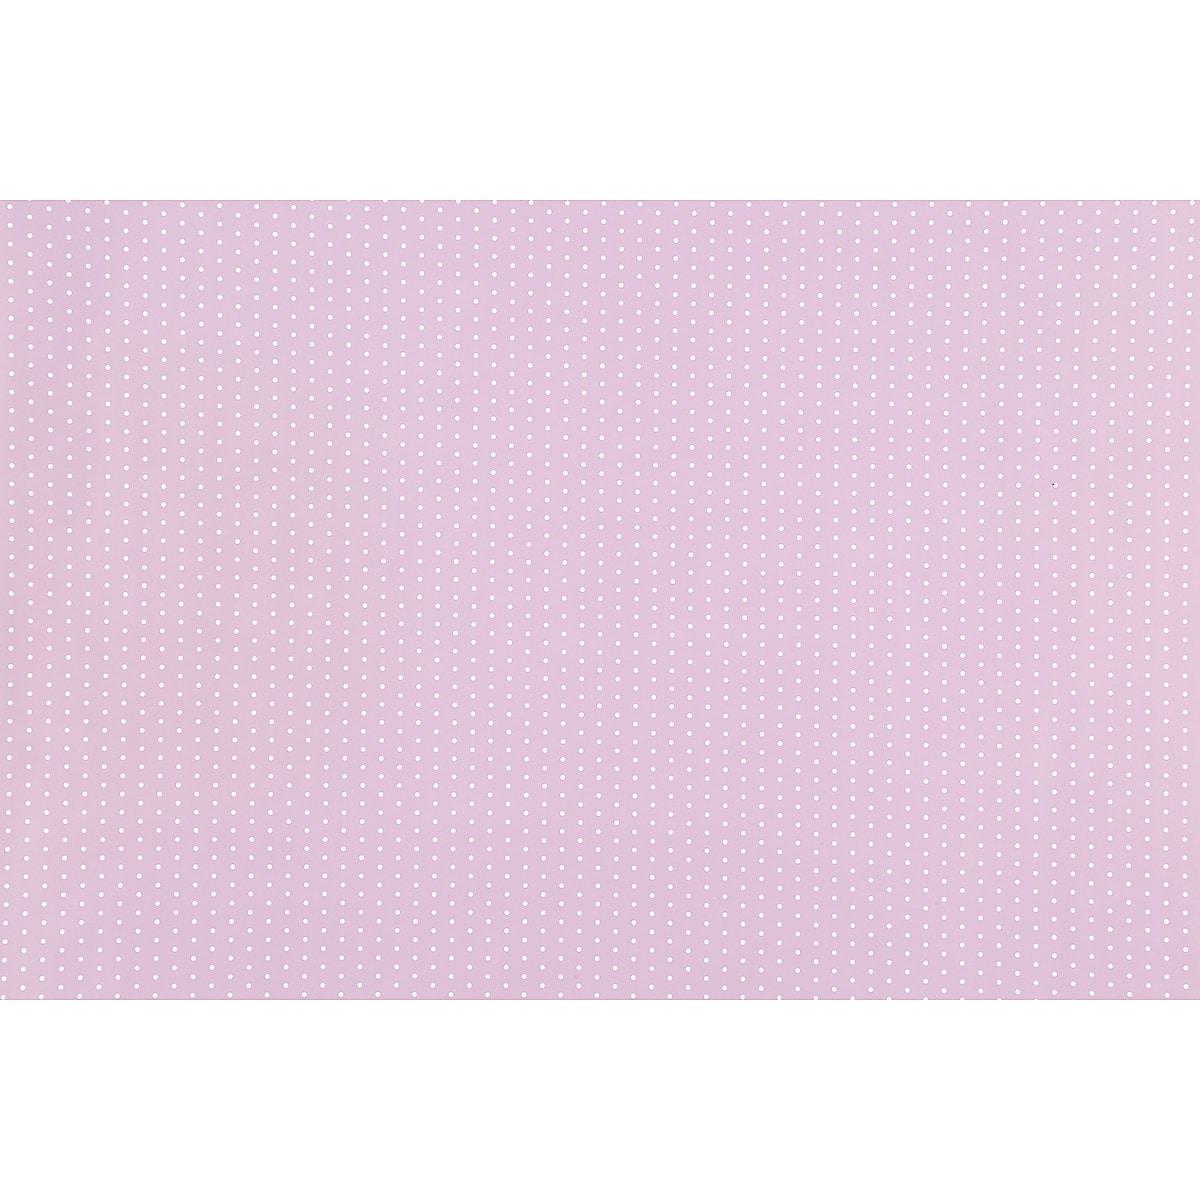 Gift Wrap, 4 m x 70 cm